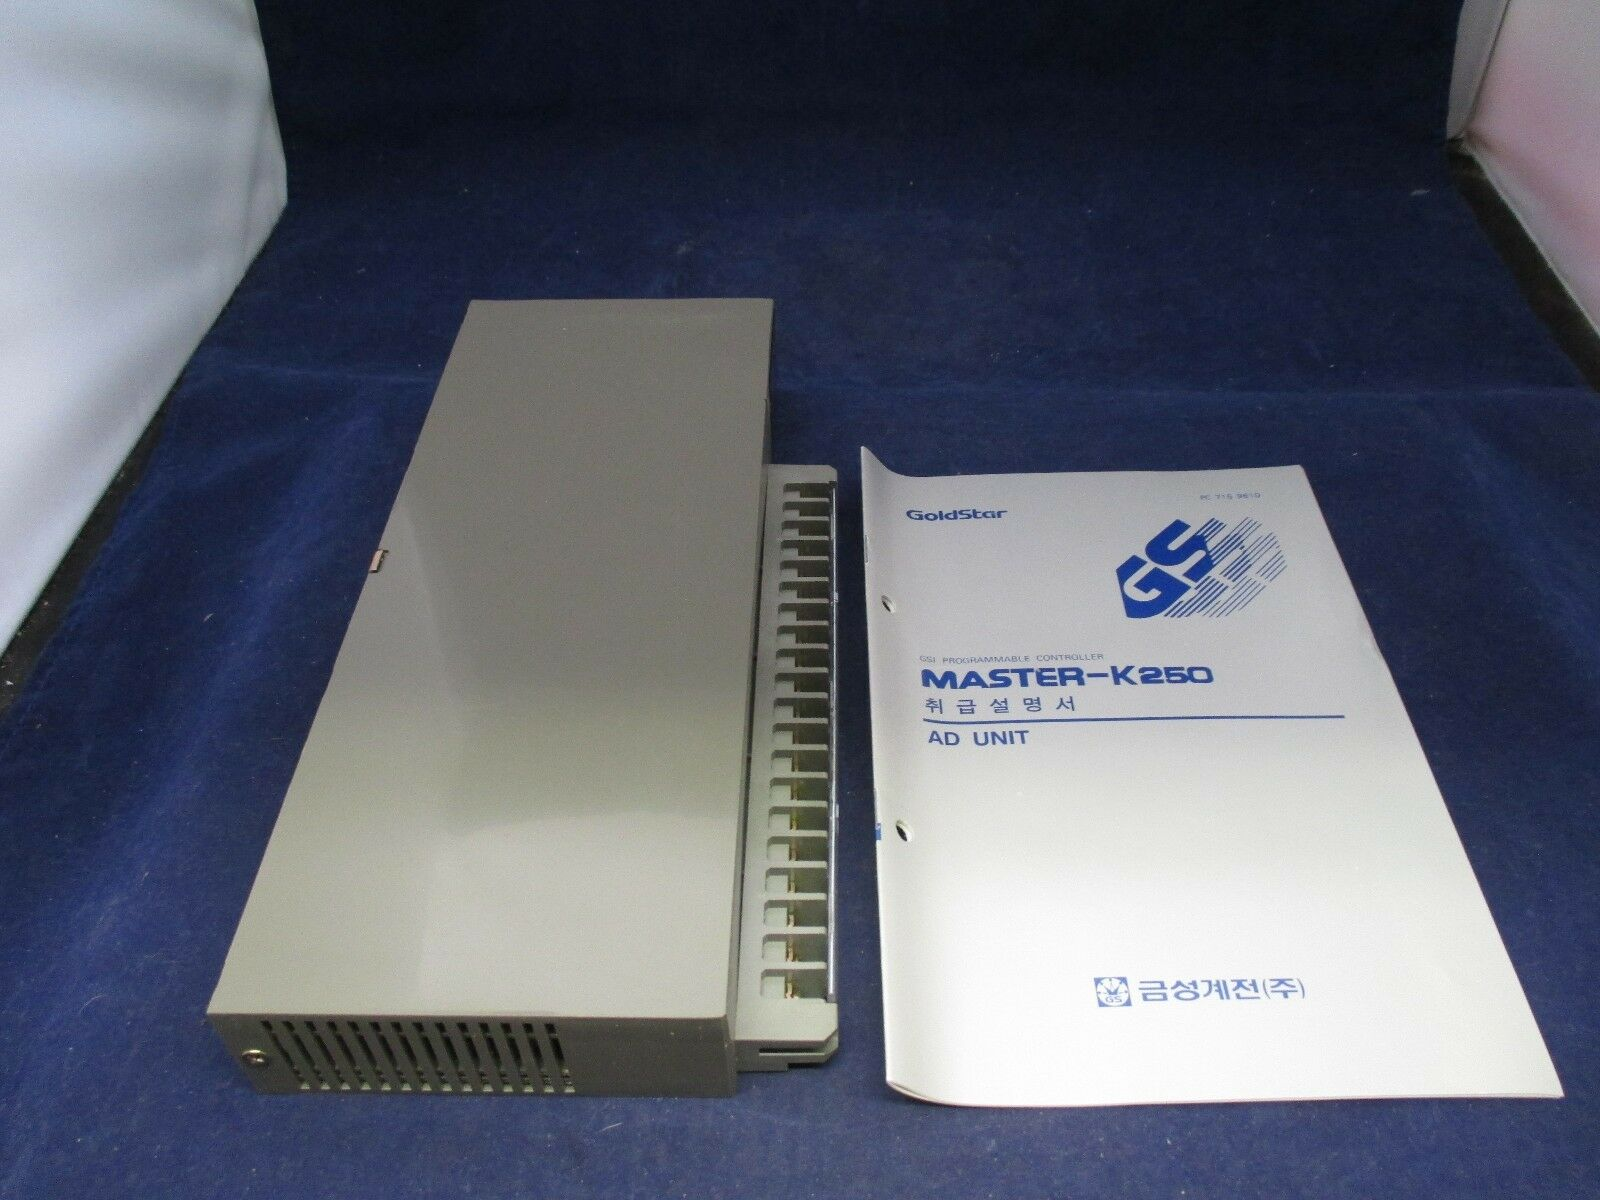 goldStar K5F-AD03 Master-K250  Analog Input Module  new